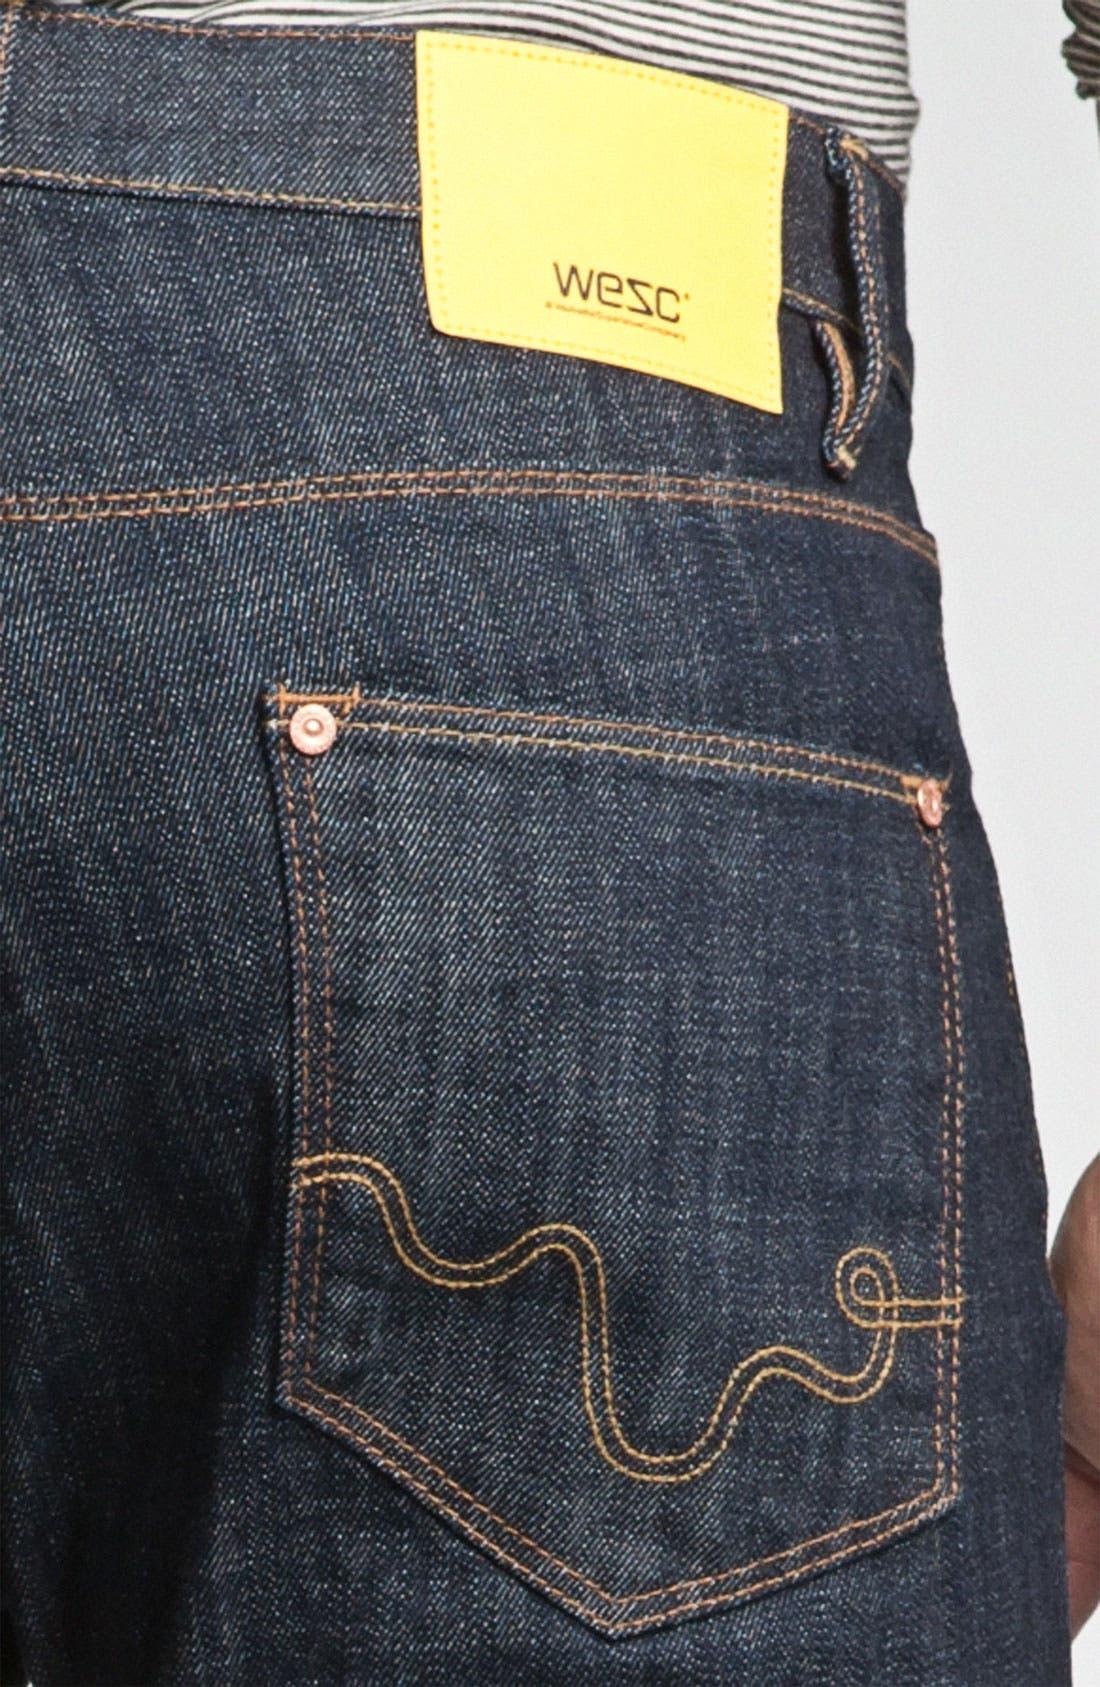 Alternate Image 3  - WeSC 'Eddy' Slim Fit Jeans (Bright)